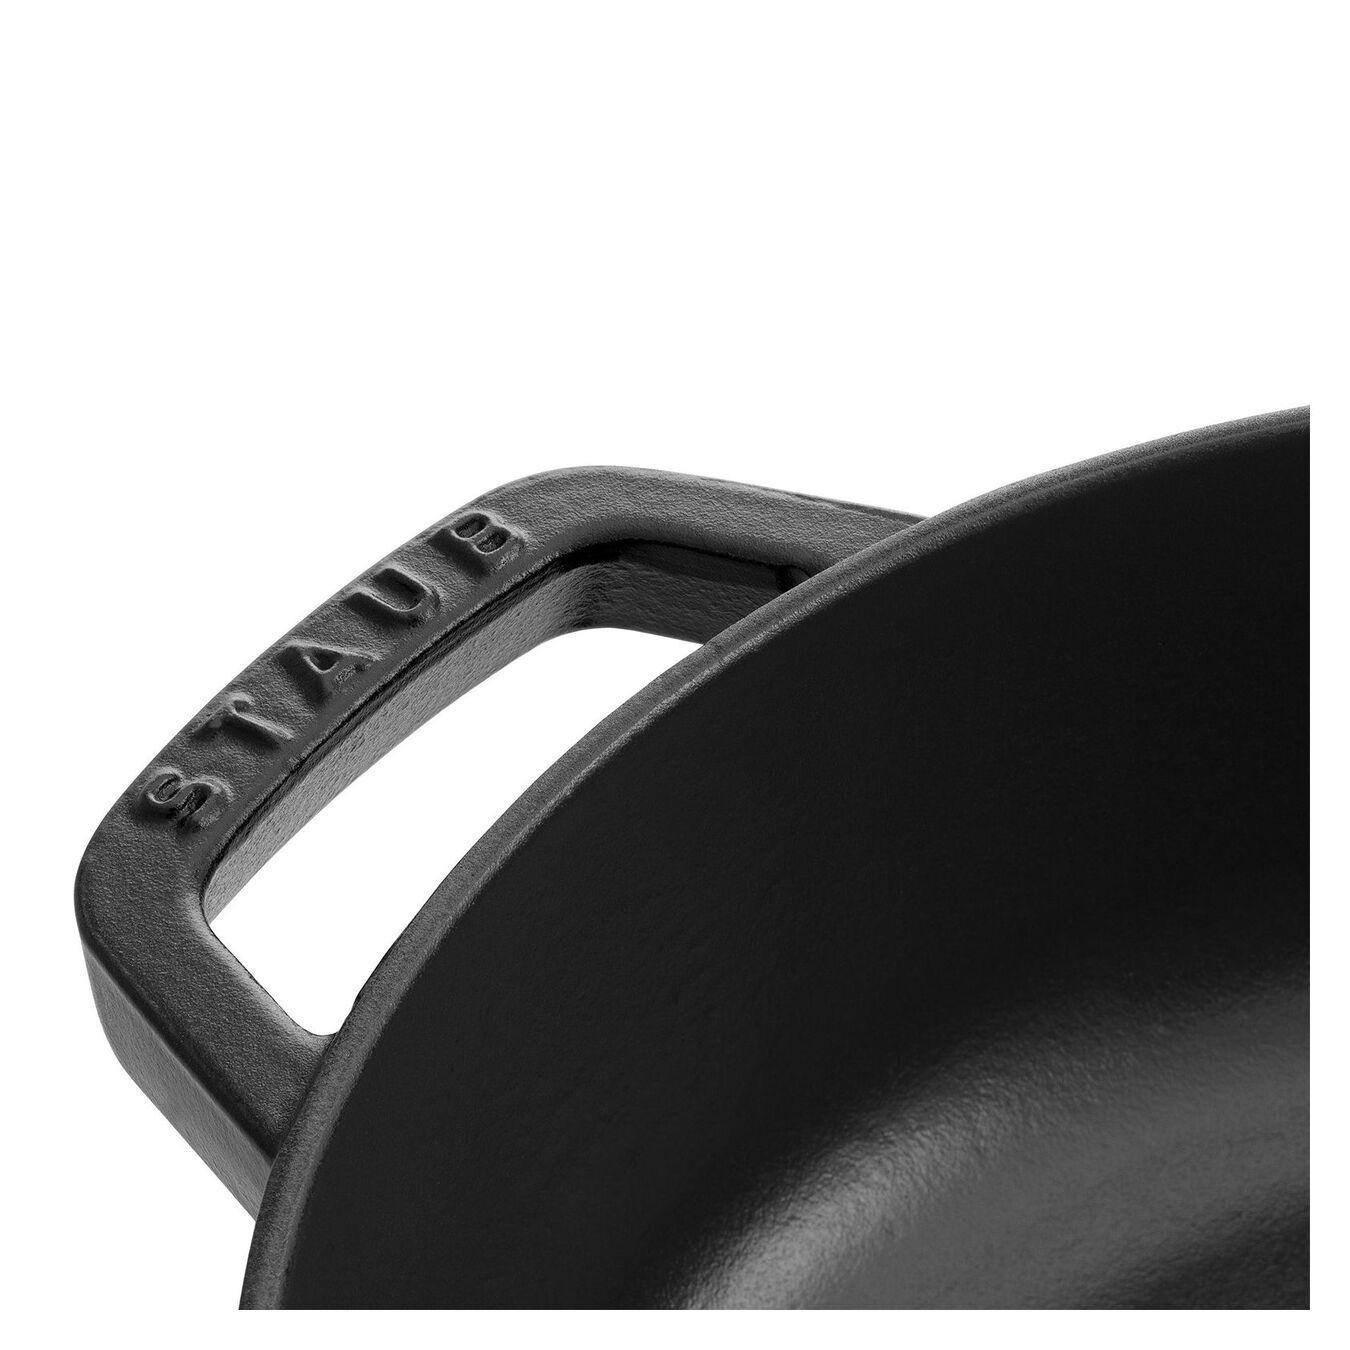 3,75 l Cast iron round Sauteuse Chistera, black,,large 3